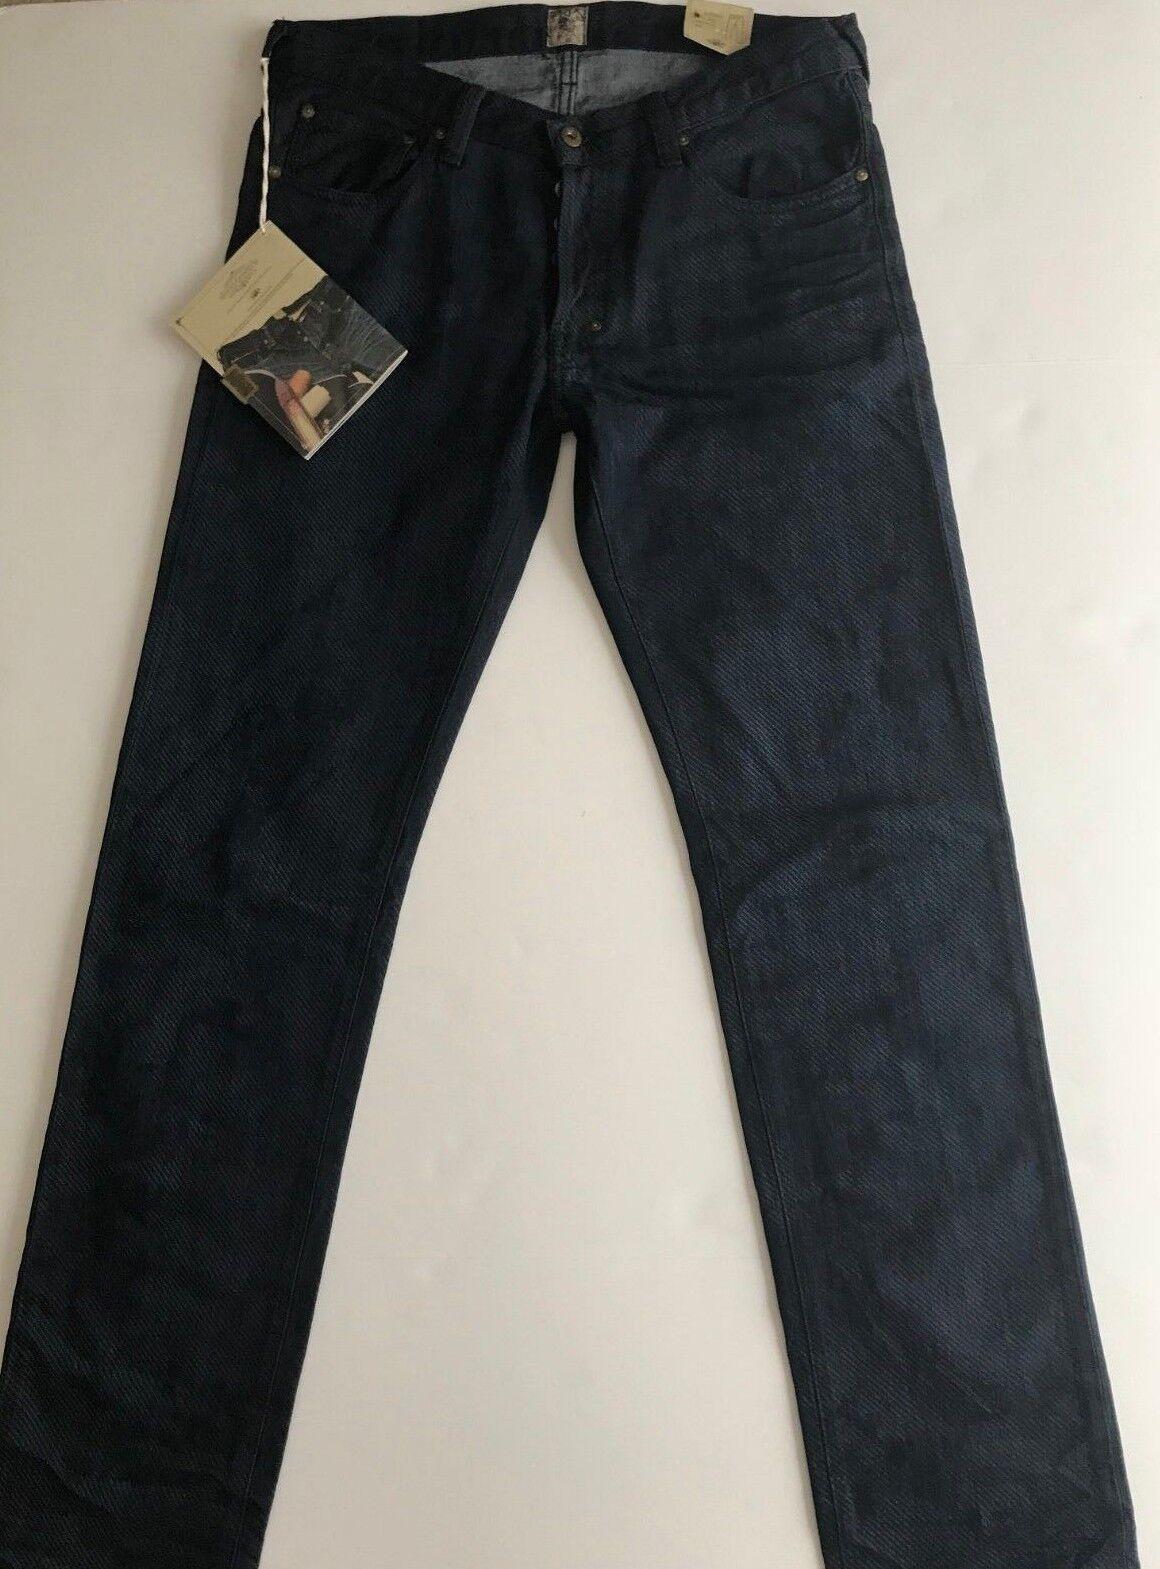 Nwt Prps Goods & Co Sz34 Rambler Nadelstreifen Hautenge Jeans Dunkles Indigoblau